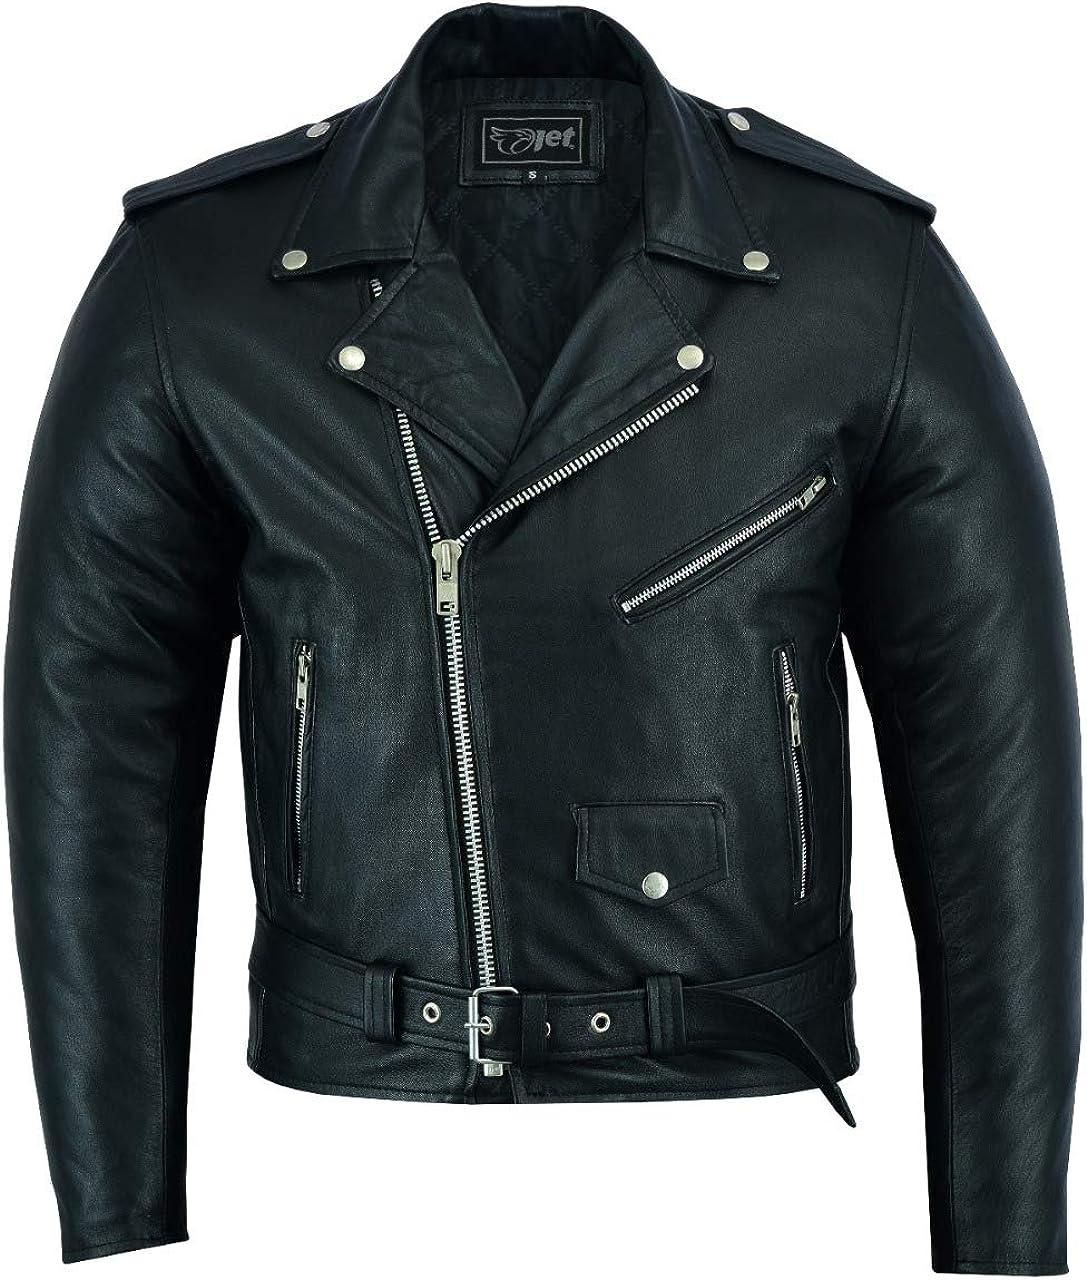 Portland Hide Mens Leather Jacket Fashion Premium Soft Feel Lamb Skin Classic Vintage Iconic Retro